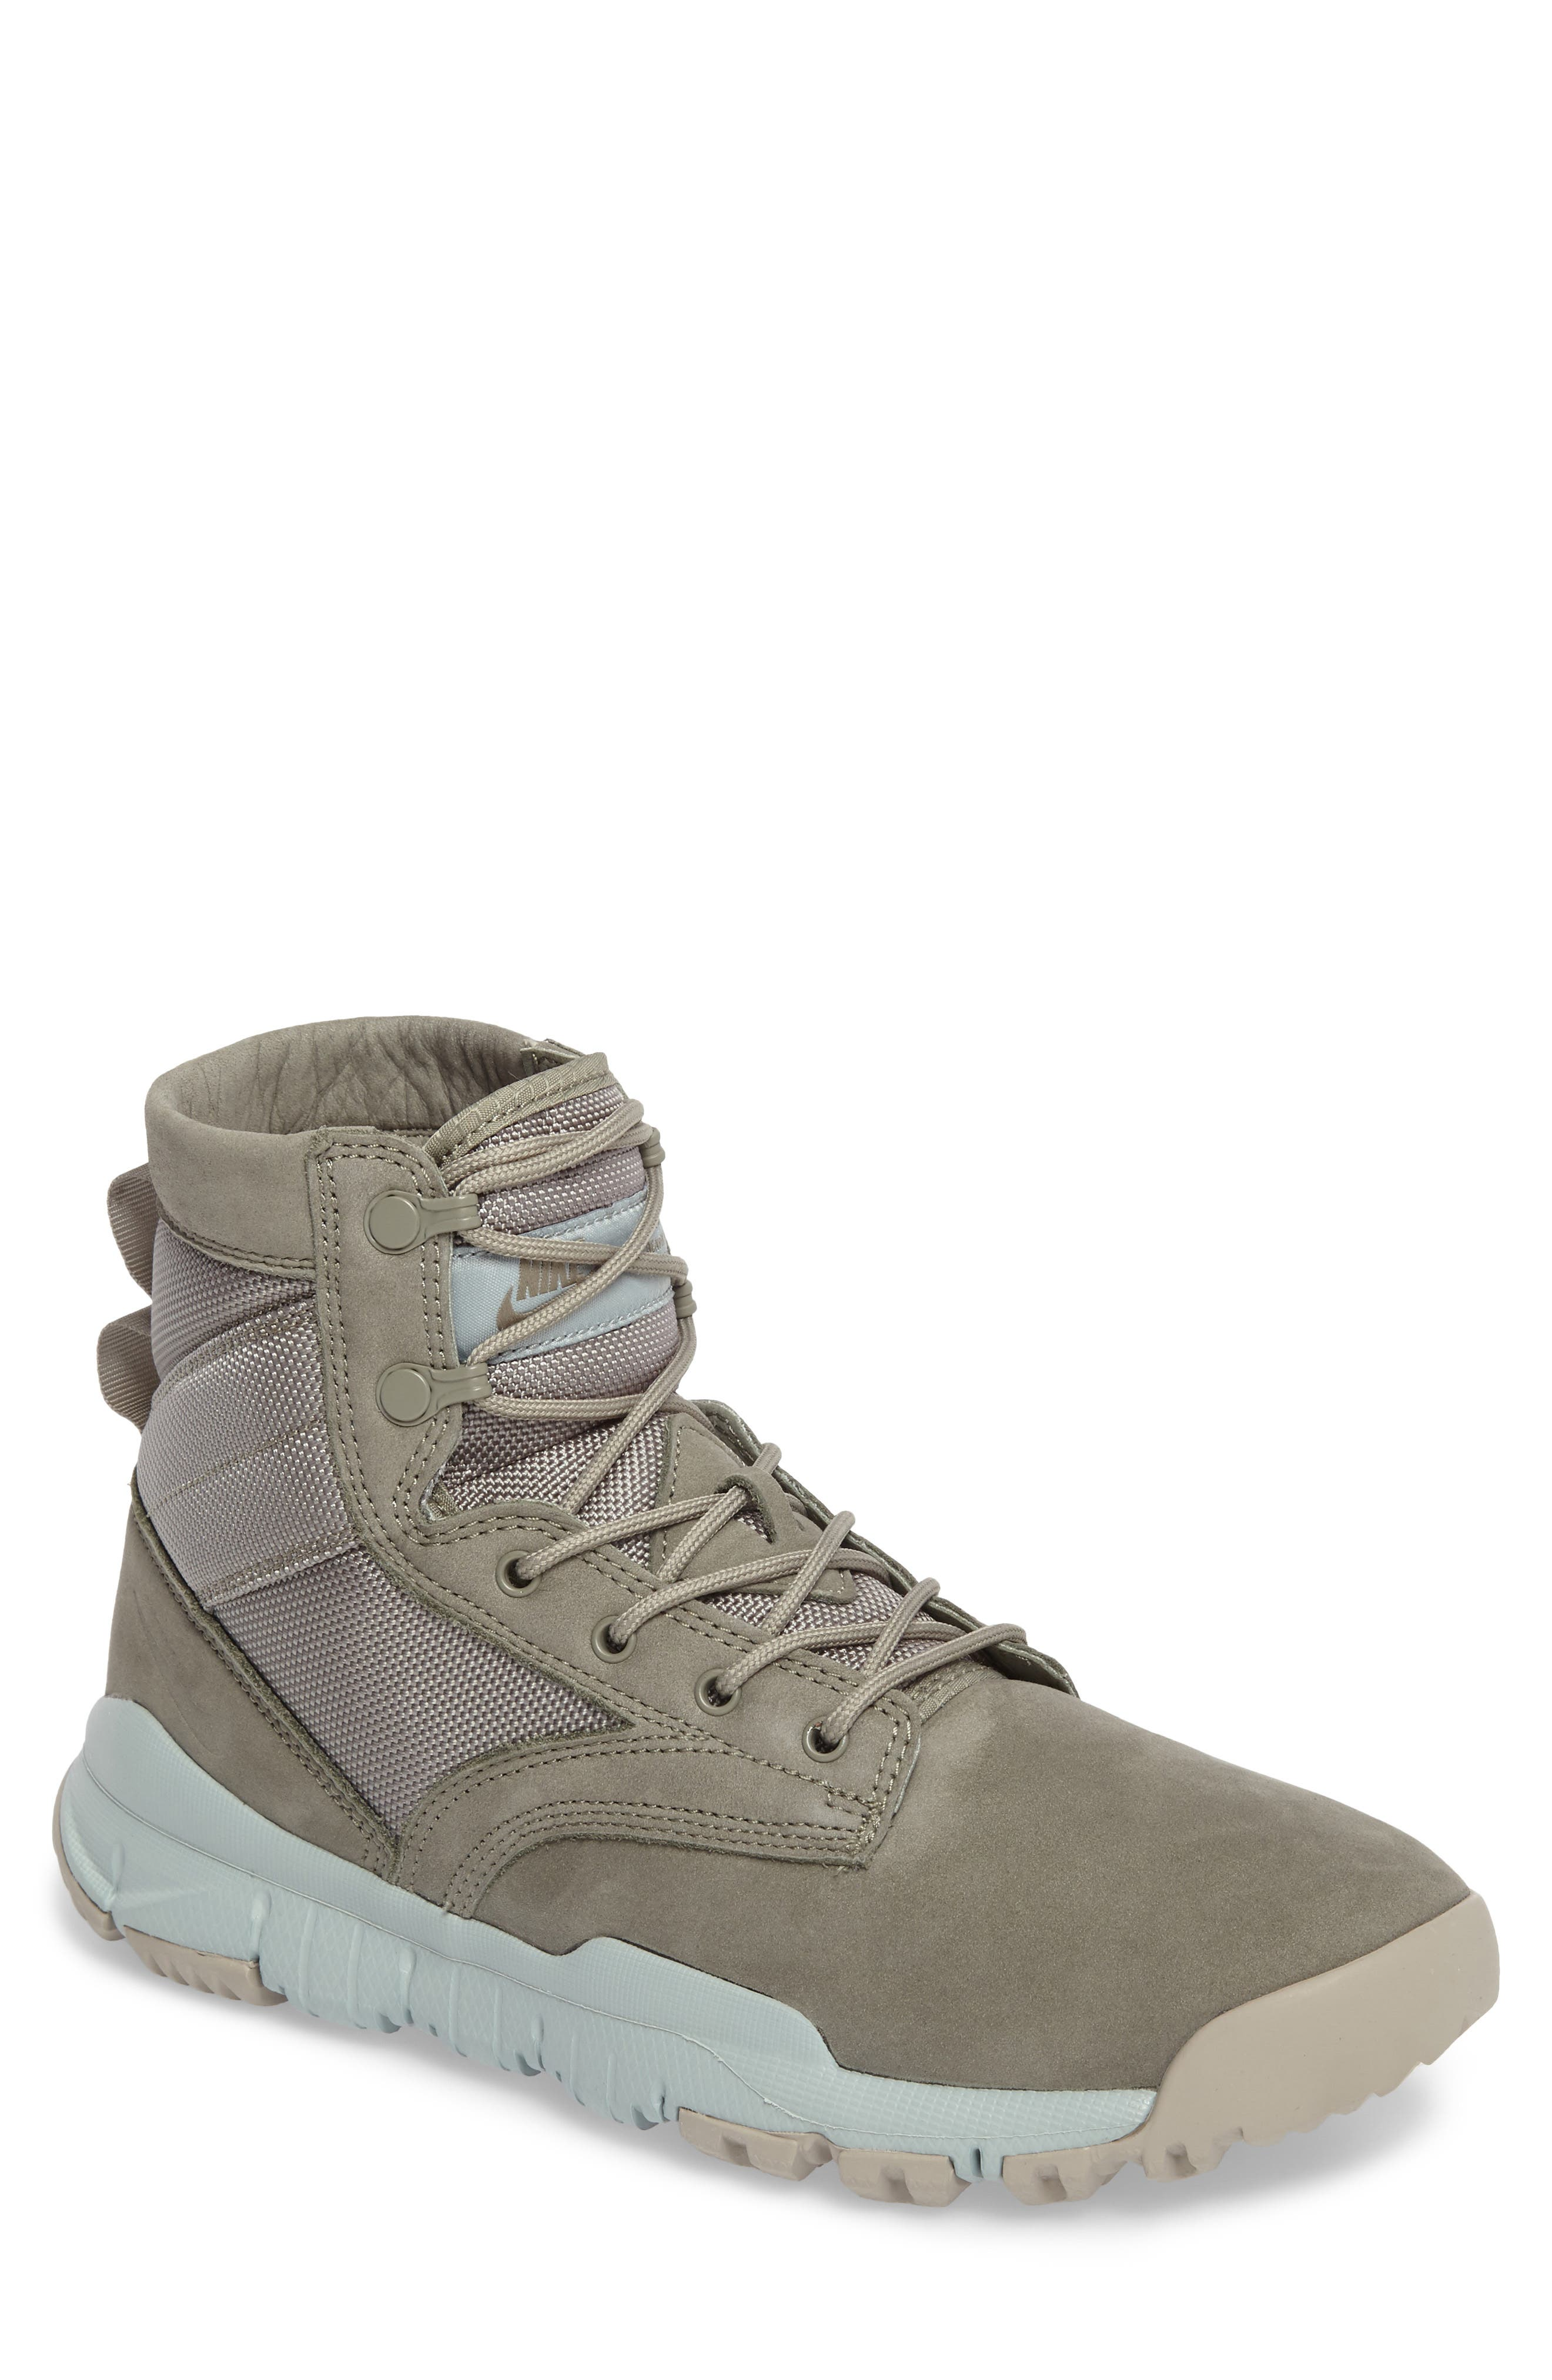 Alternate Image 1 Selected - Nike 'SFB' Plain Toe Boot (Men)